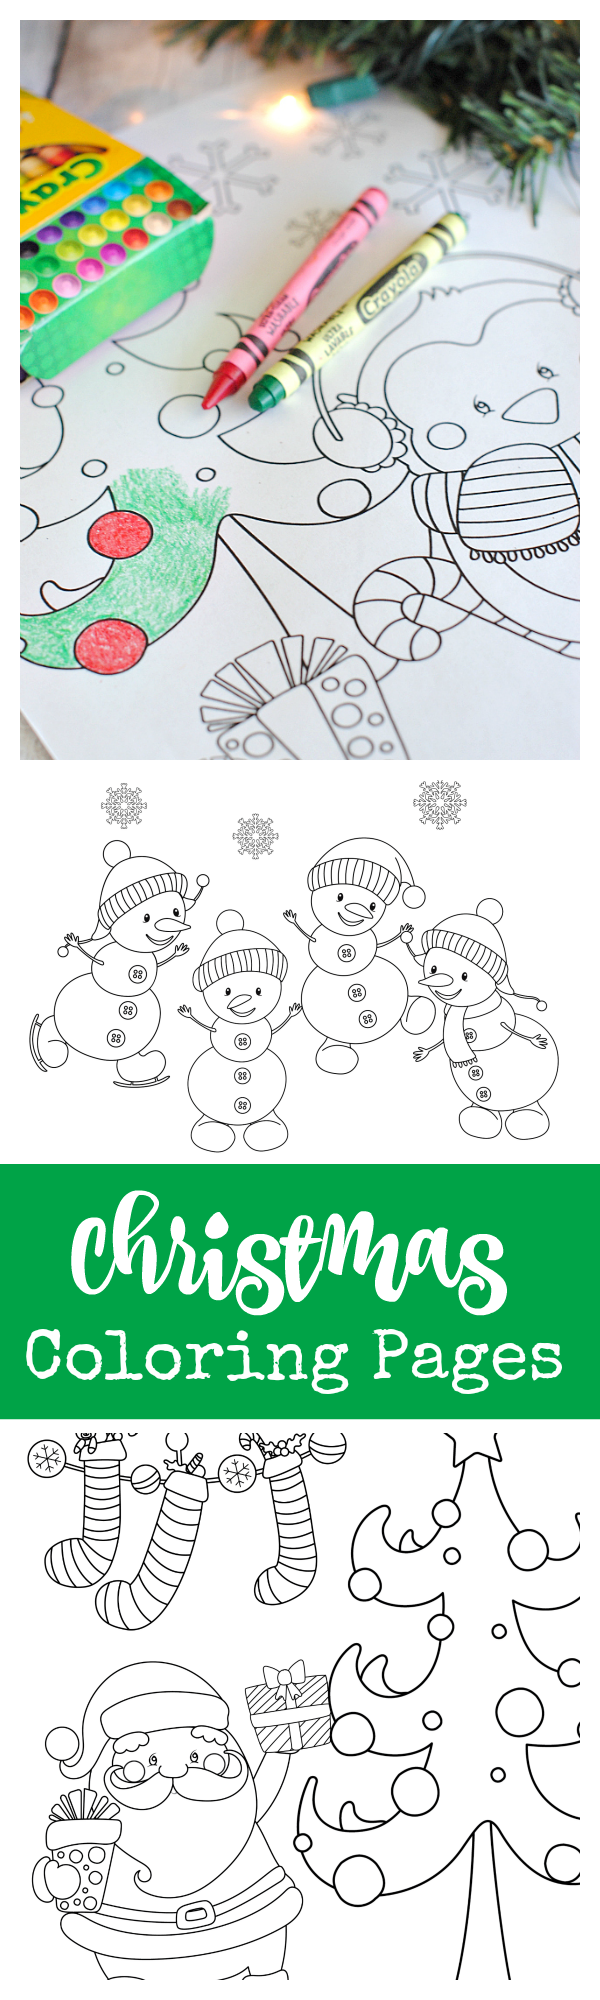 Free Printable Christmas Coloring Pages | Christmas Cheer ...